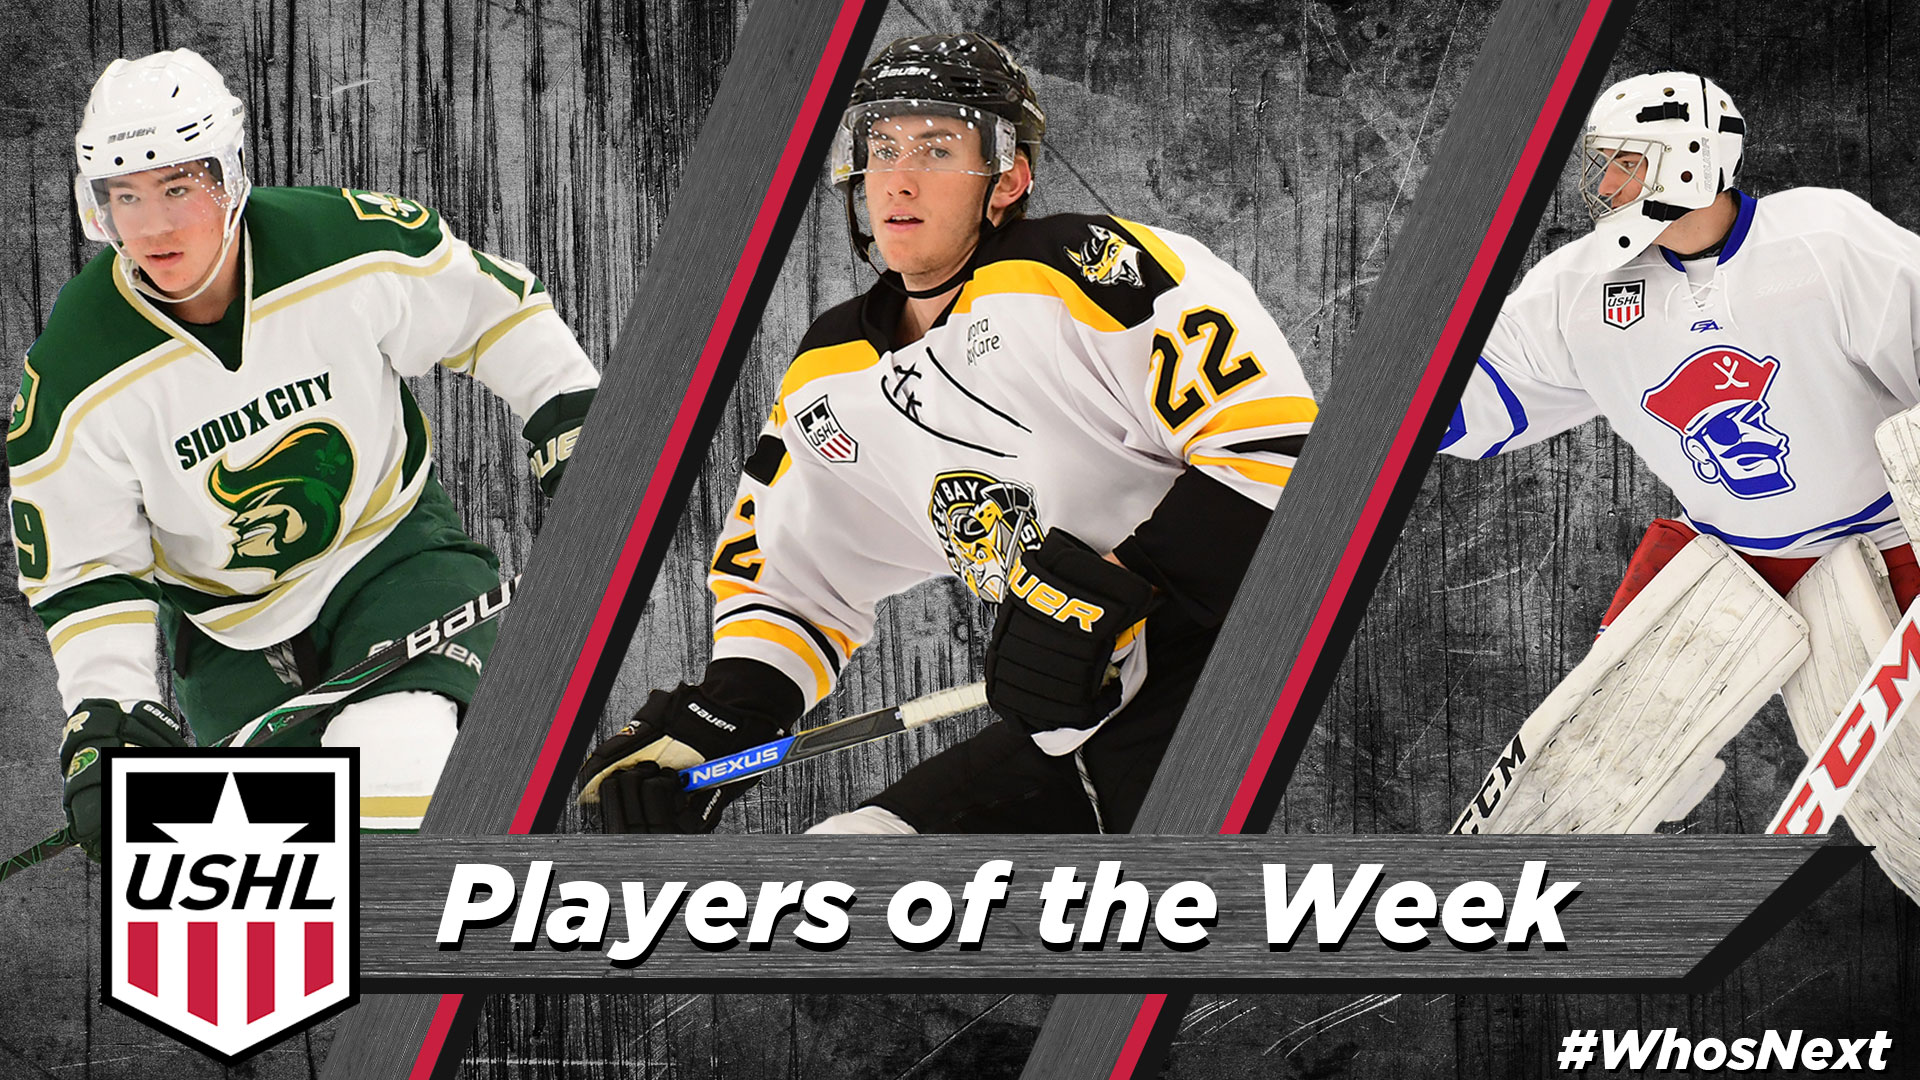 USHL: USHL Players Of The Week - Week 6, 2018-19